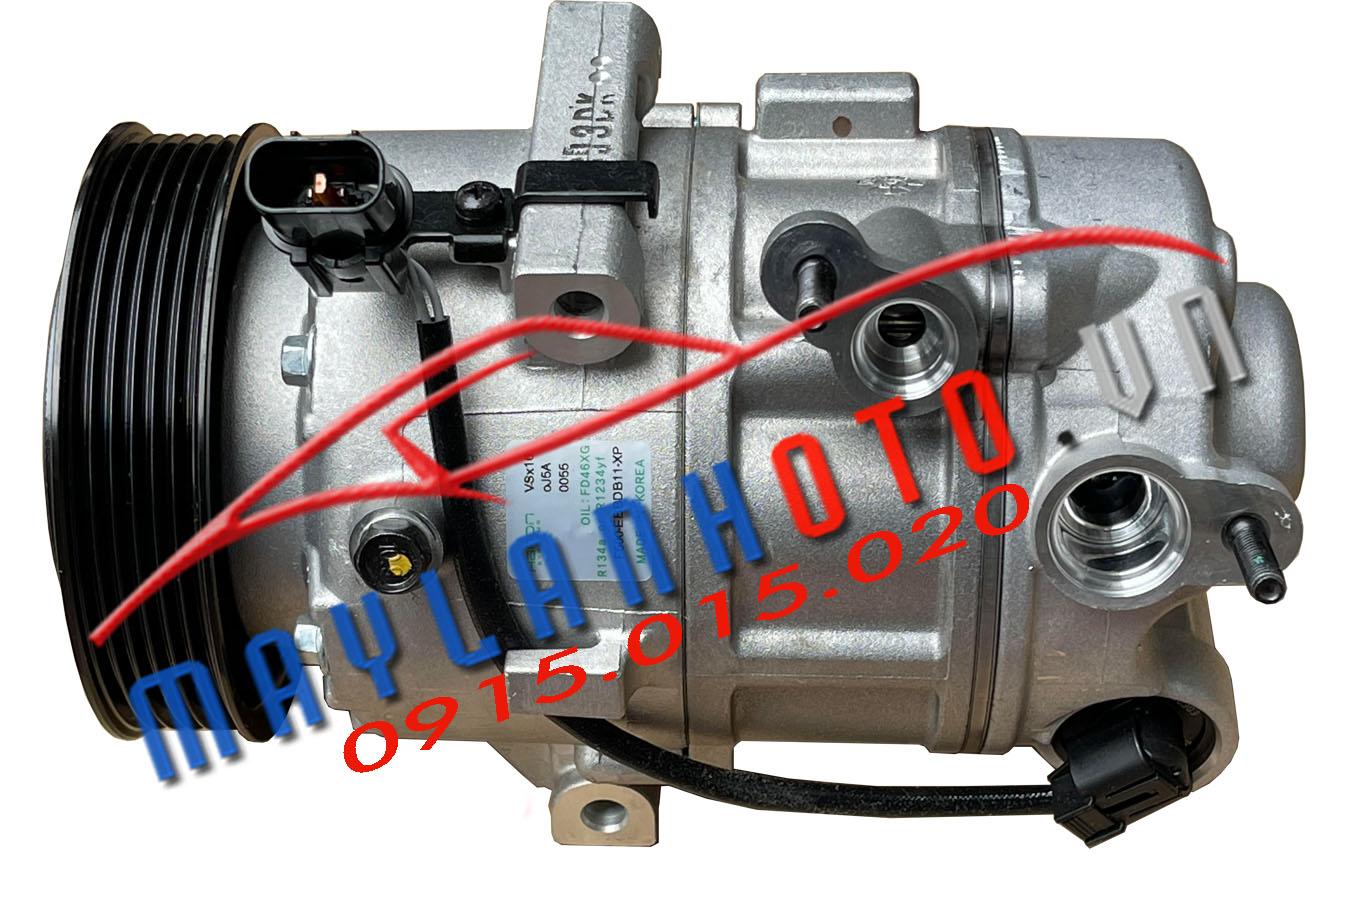 Sonata 2014/ Lốc lạnh điều hòa Huyndai Sonata 2014/ Máy nén khí điều hòa Huyndai Sonata 2014